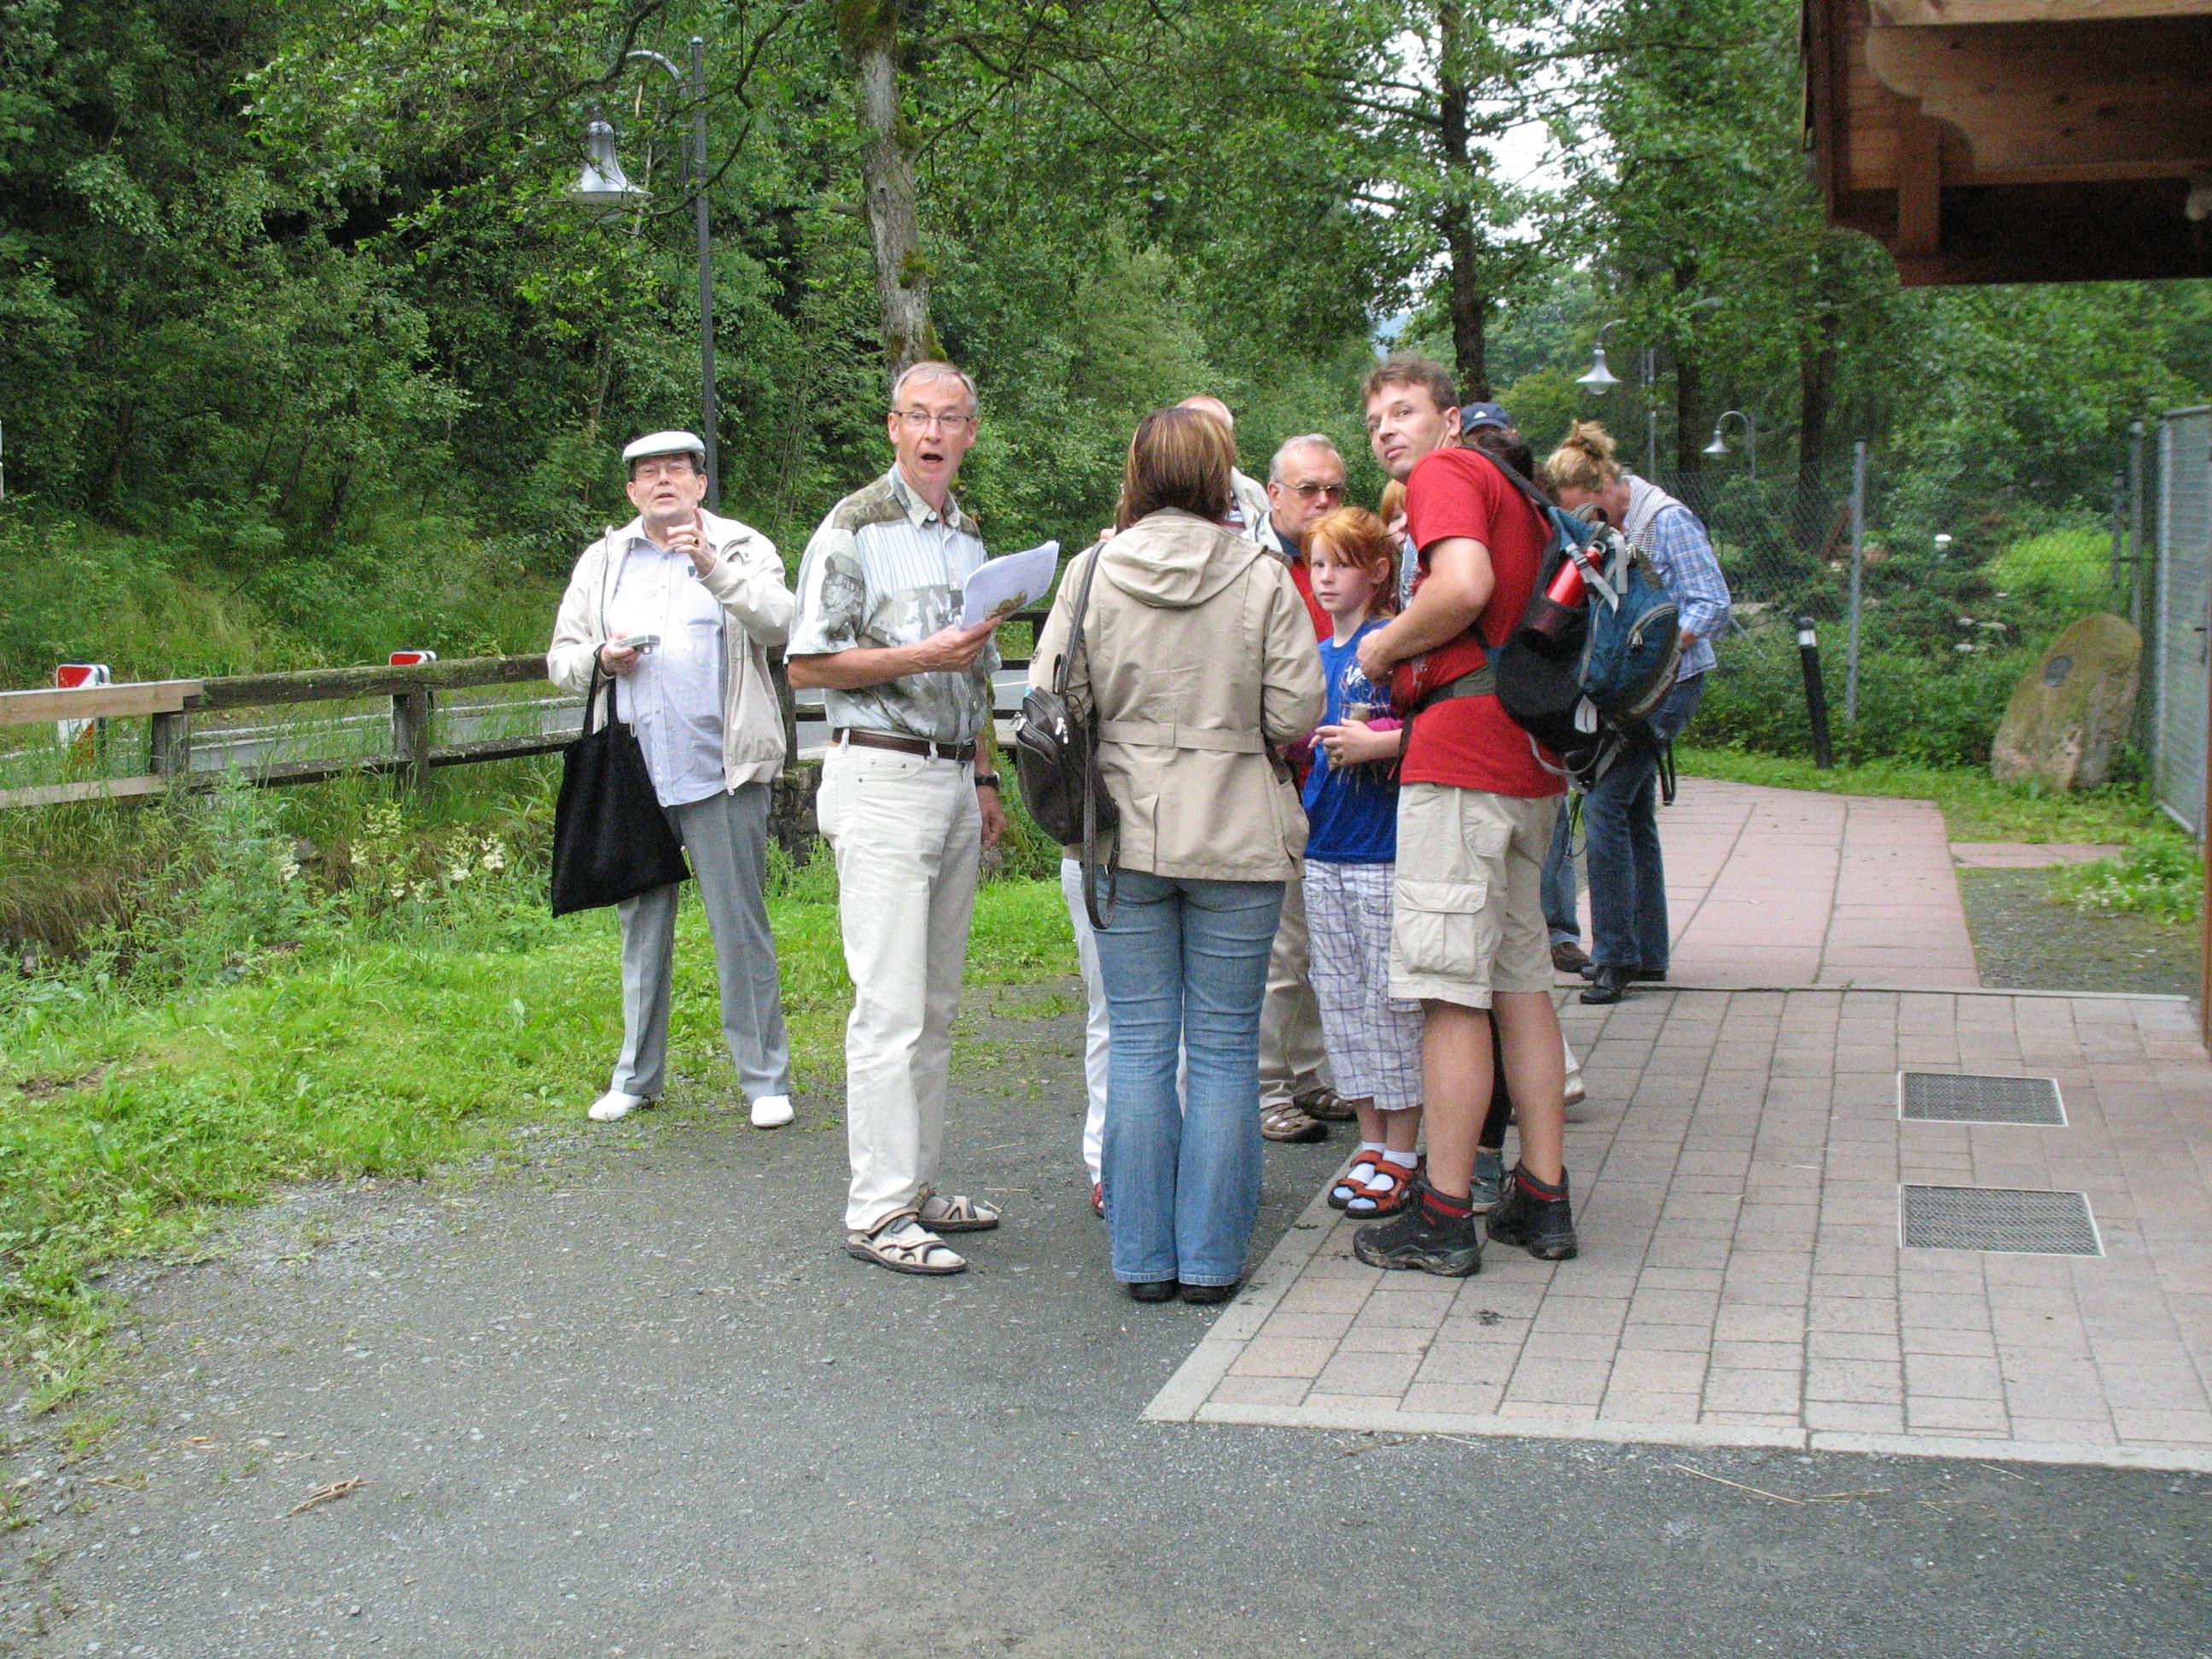 http://www.tsc-blausilber.de/media/bilder_intern/2012_Kraeuterwanderung_Blau-Silber/IMG_0043.JPG